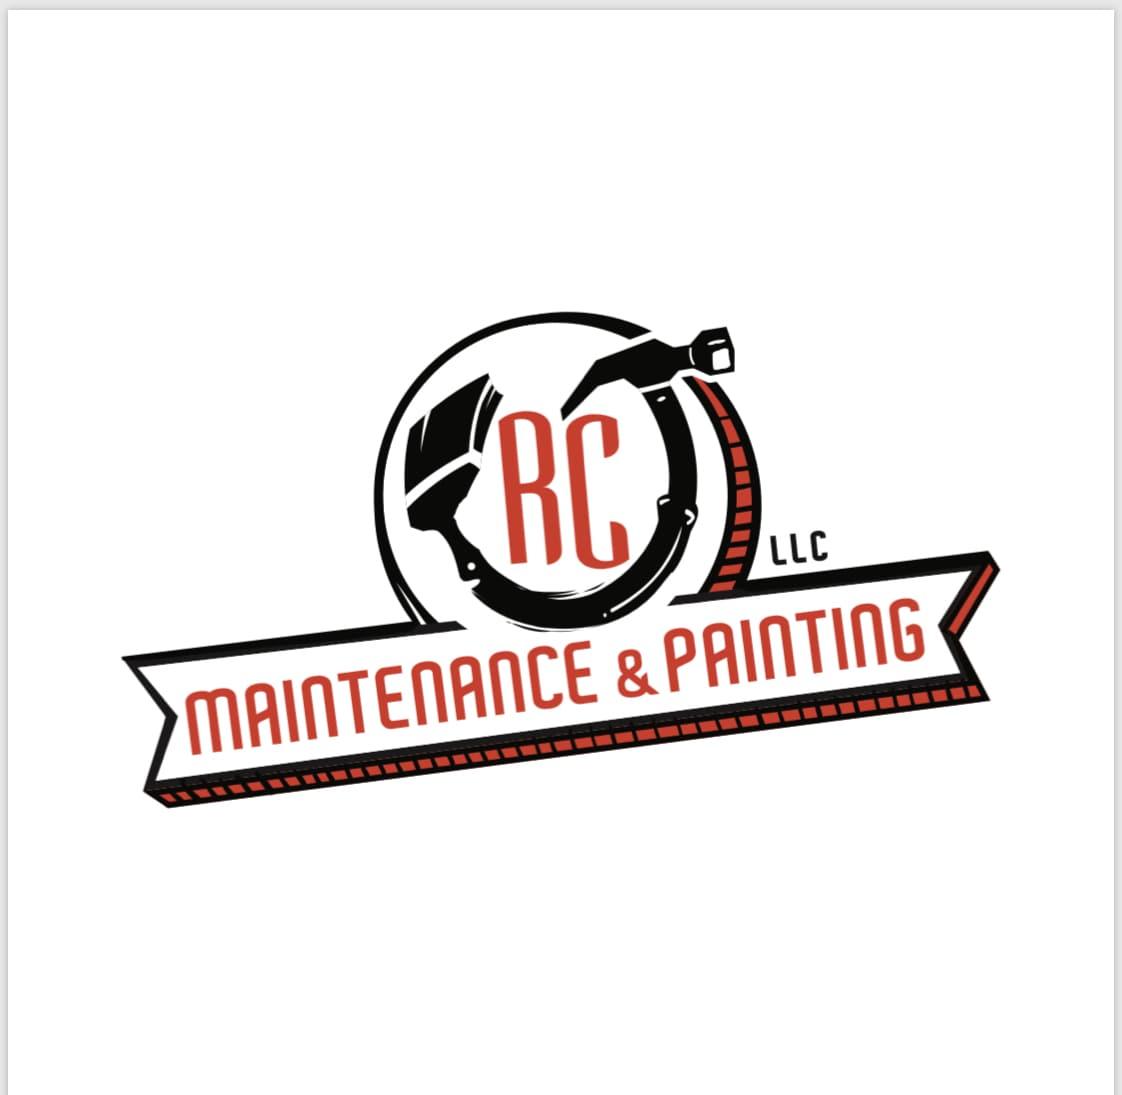 RC Maintenance & Painting, LLC logo